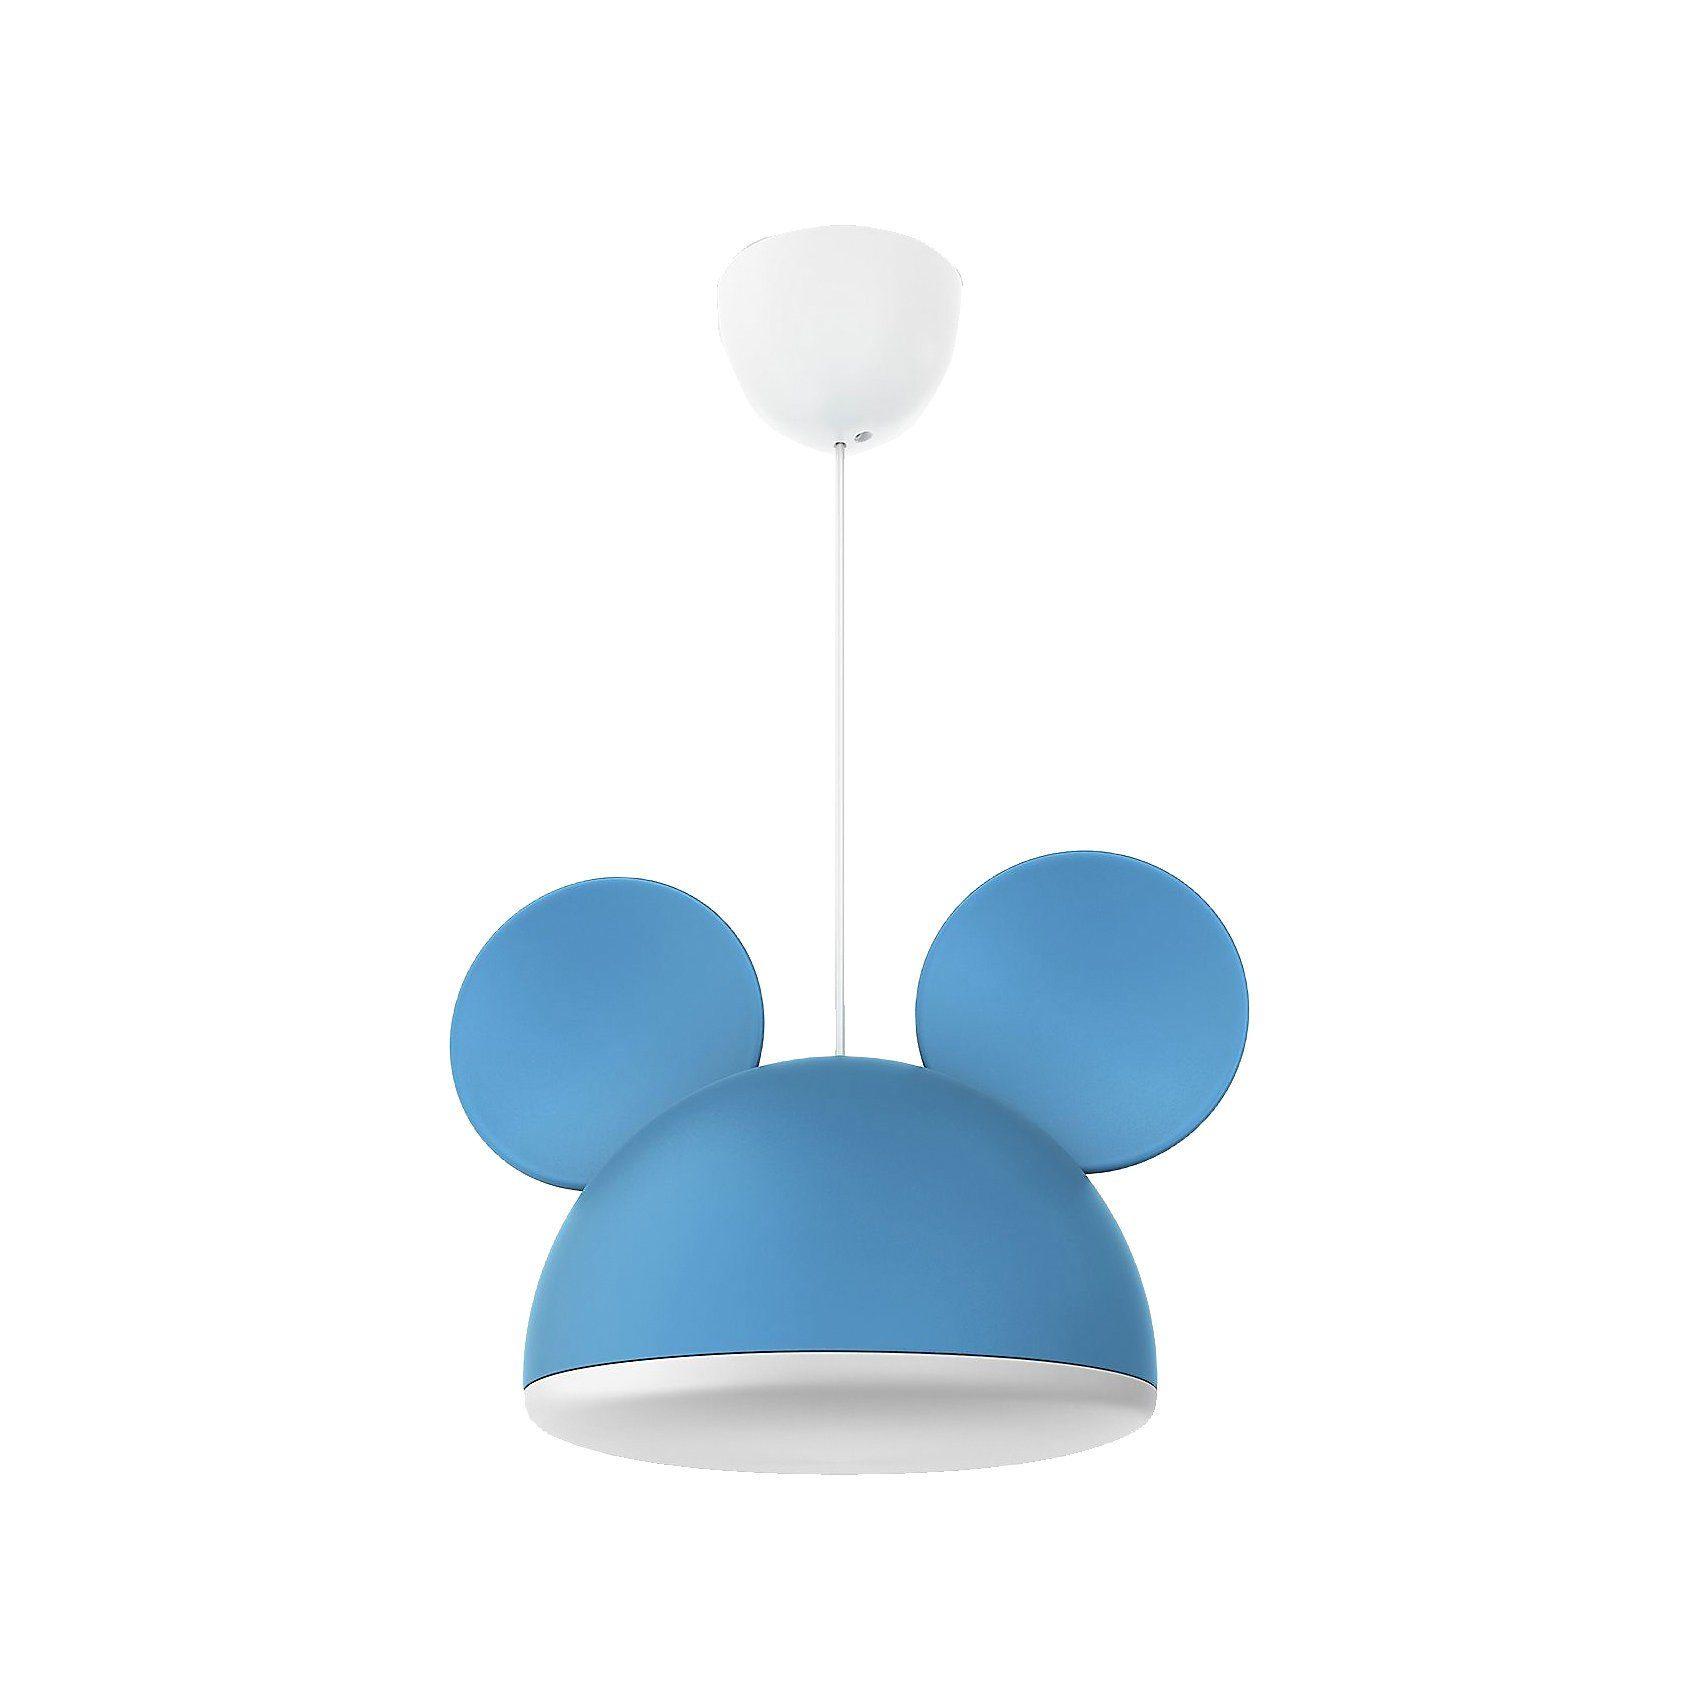 Philips Lighting Hängelampe, Mickey Mouse, blau